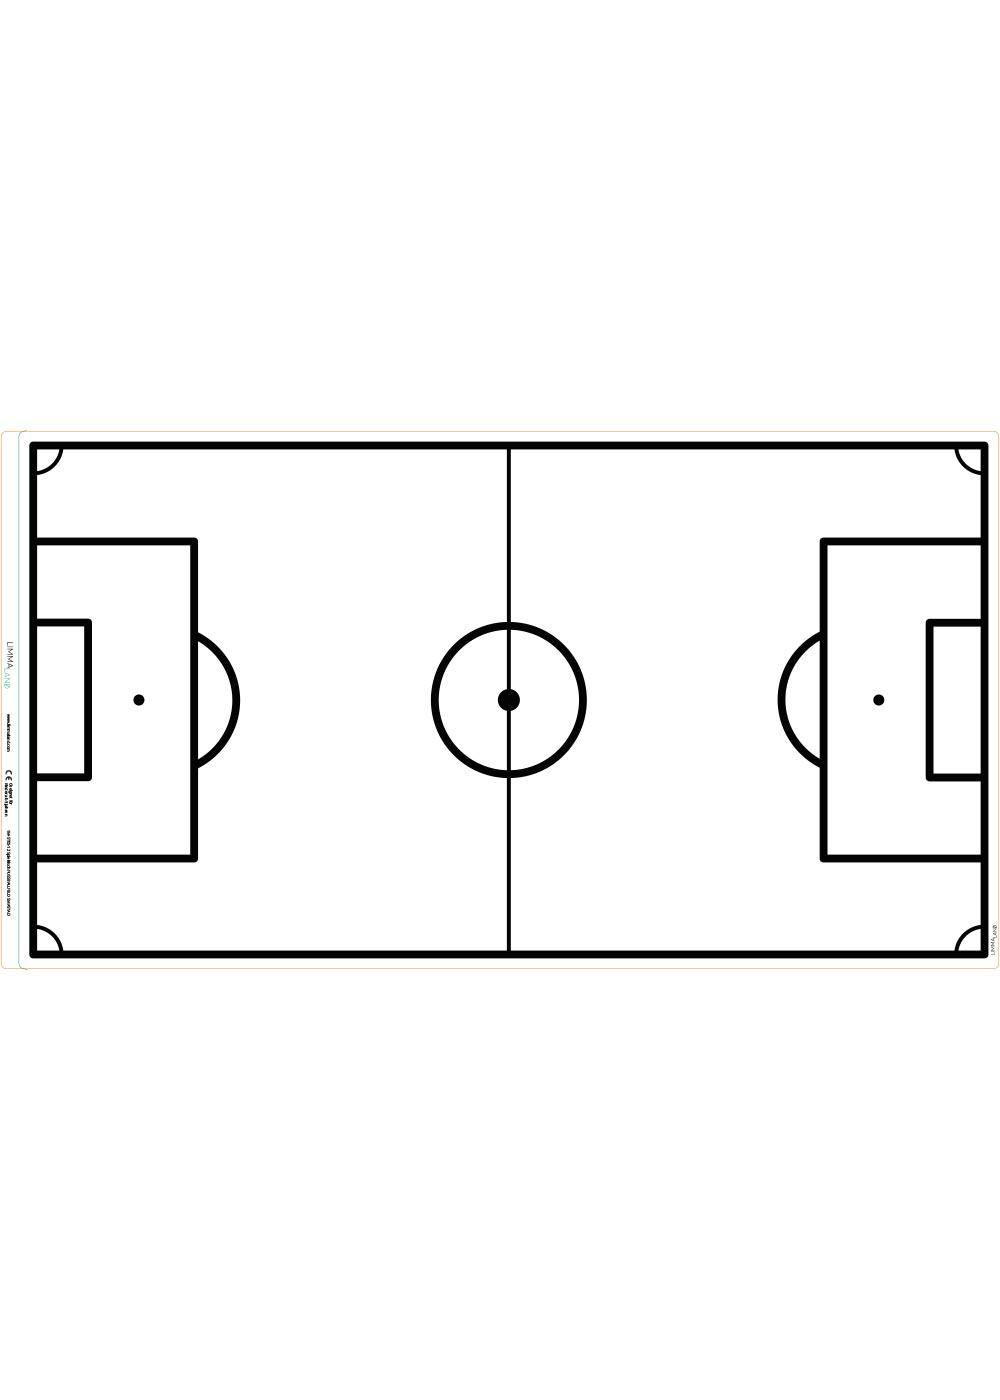 Ikea Smastad Bank Fussballfeld weiss Druckvorlage